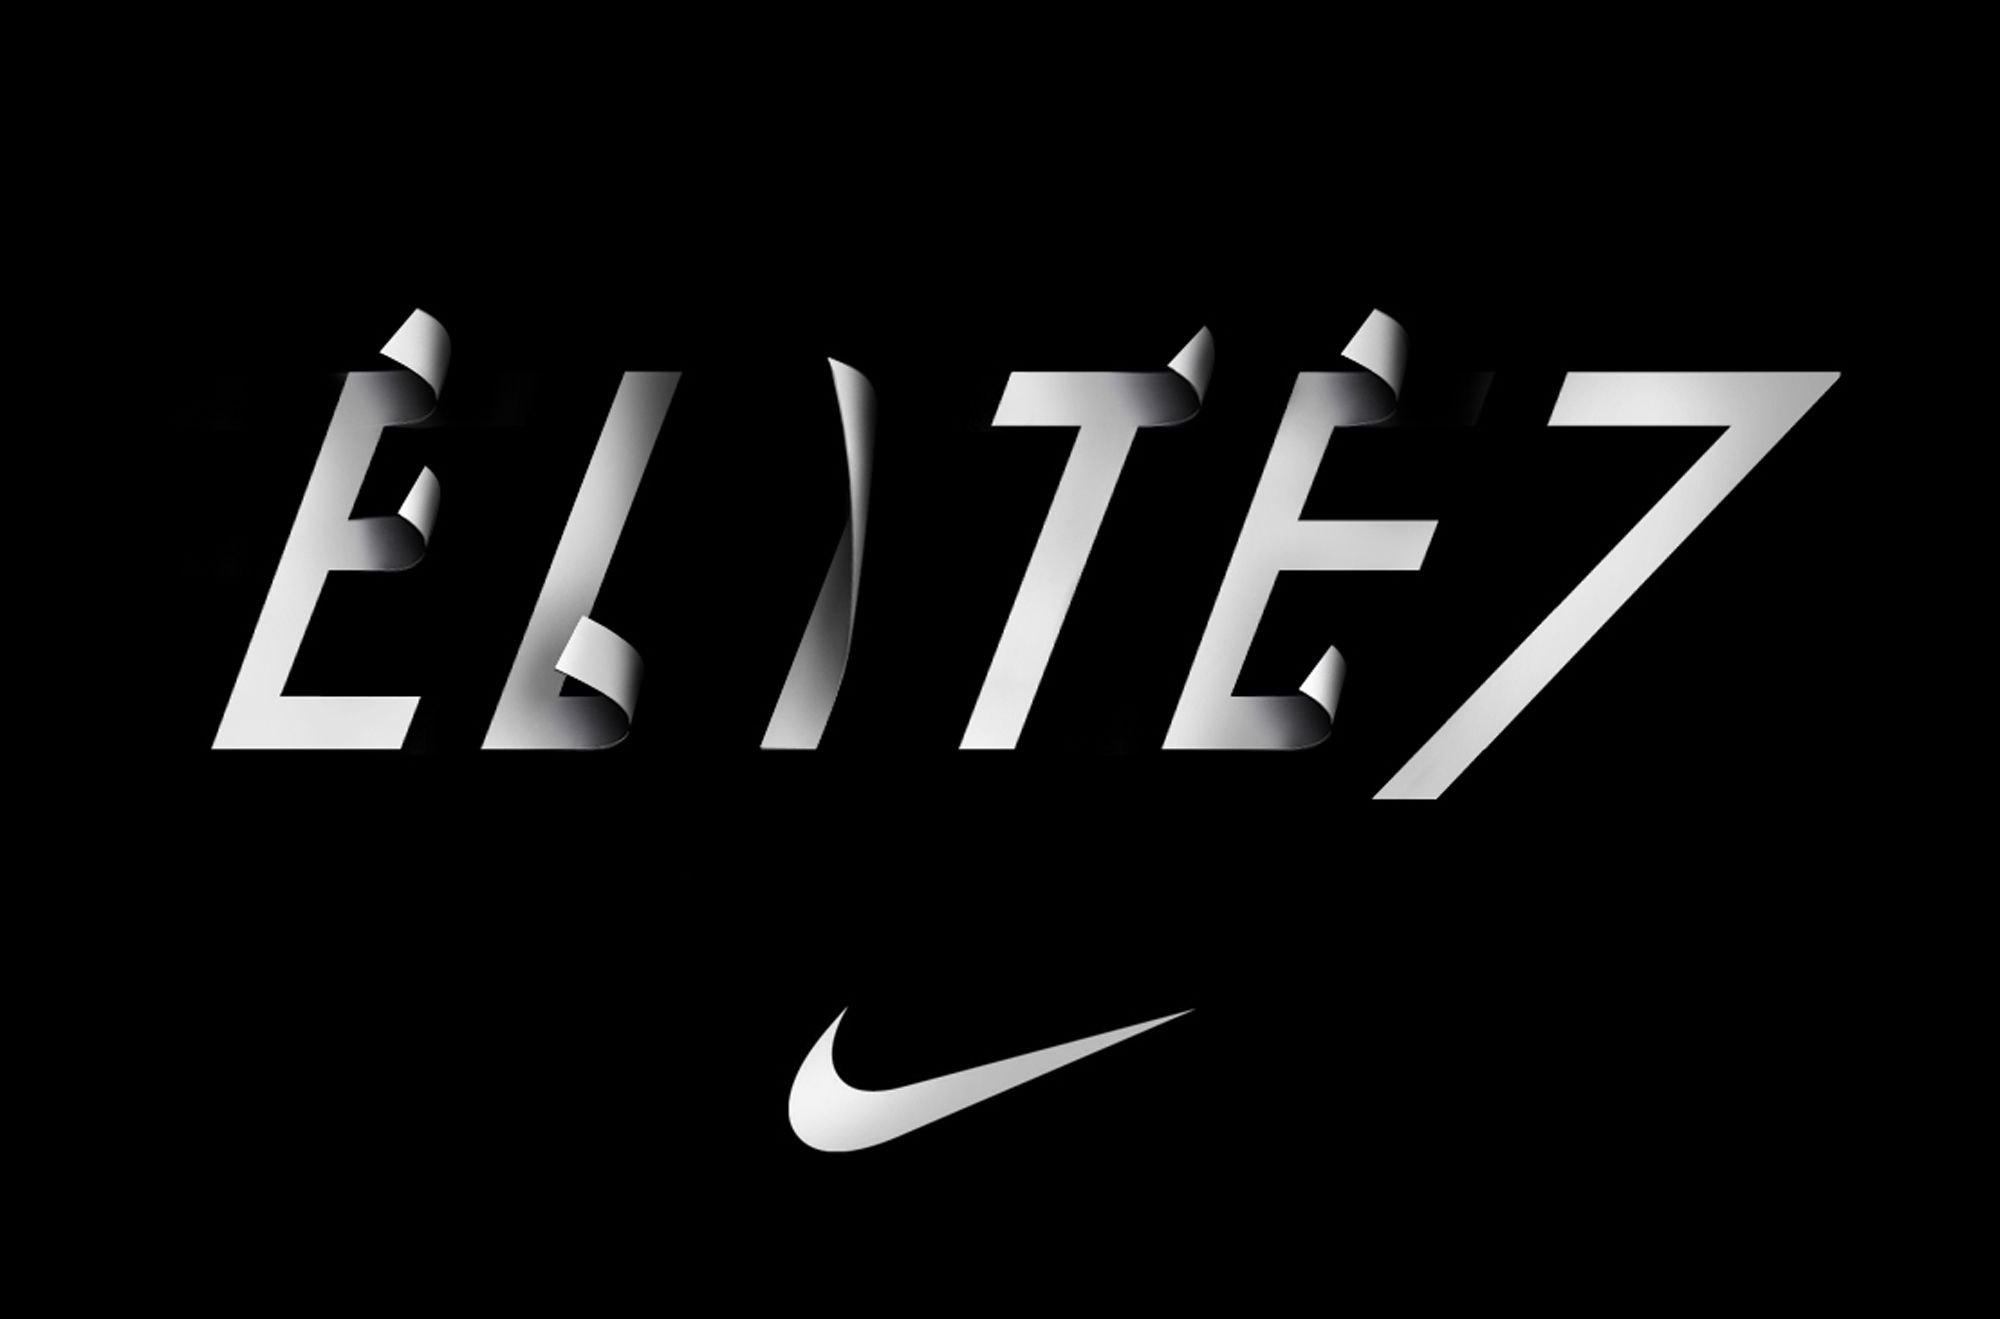 Elite 7 Nike Nike Lettering Typography